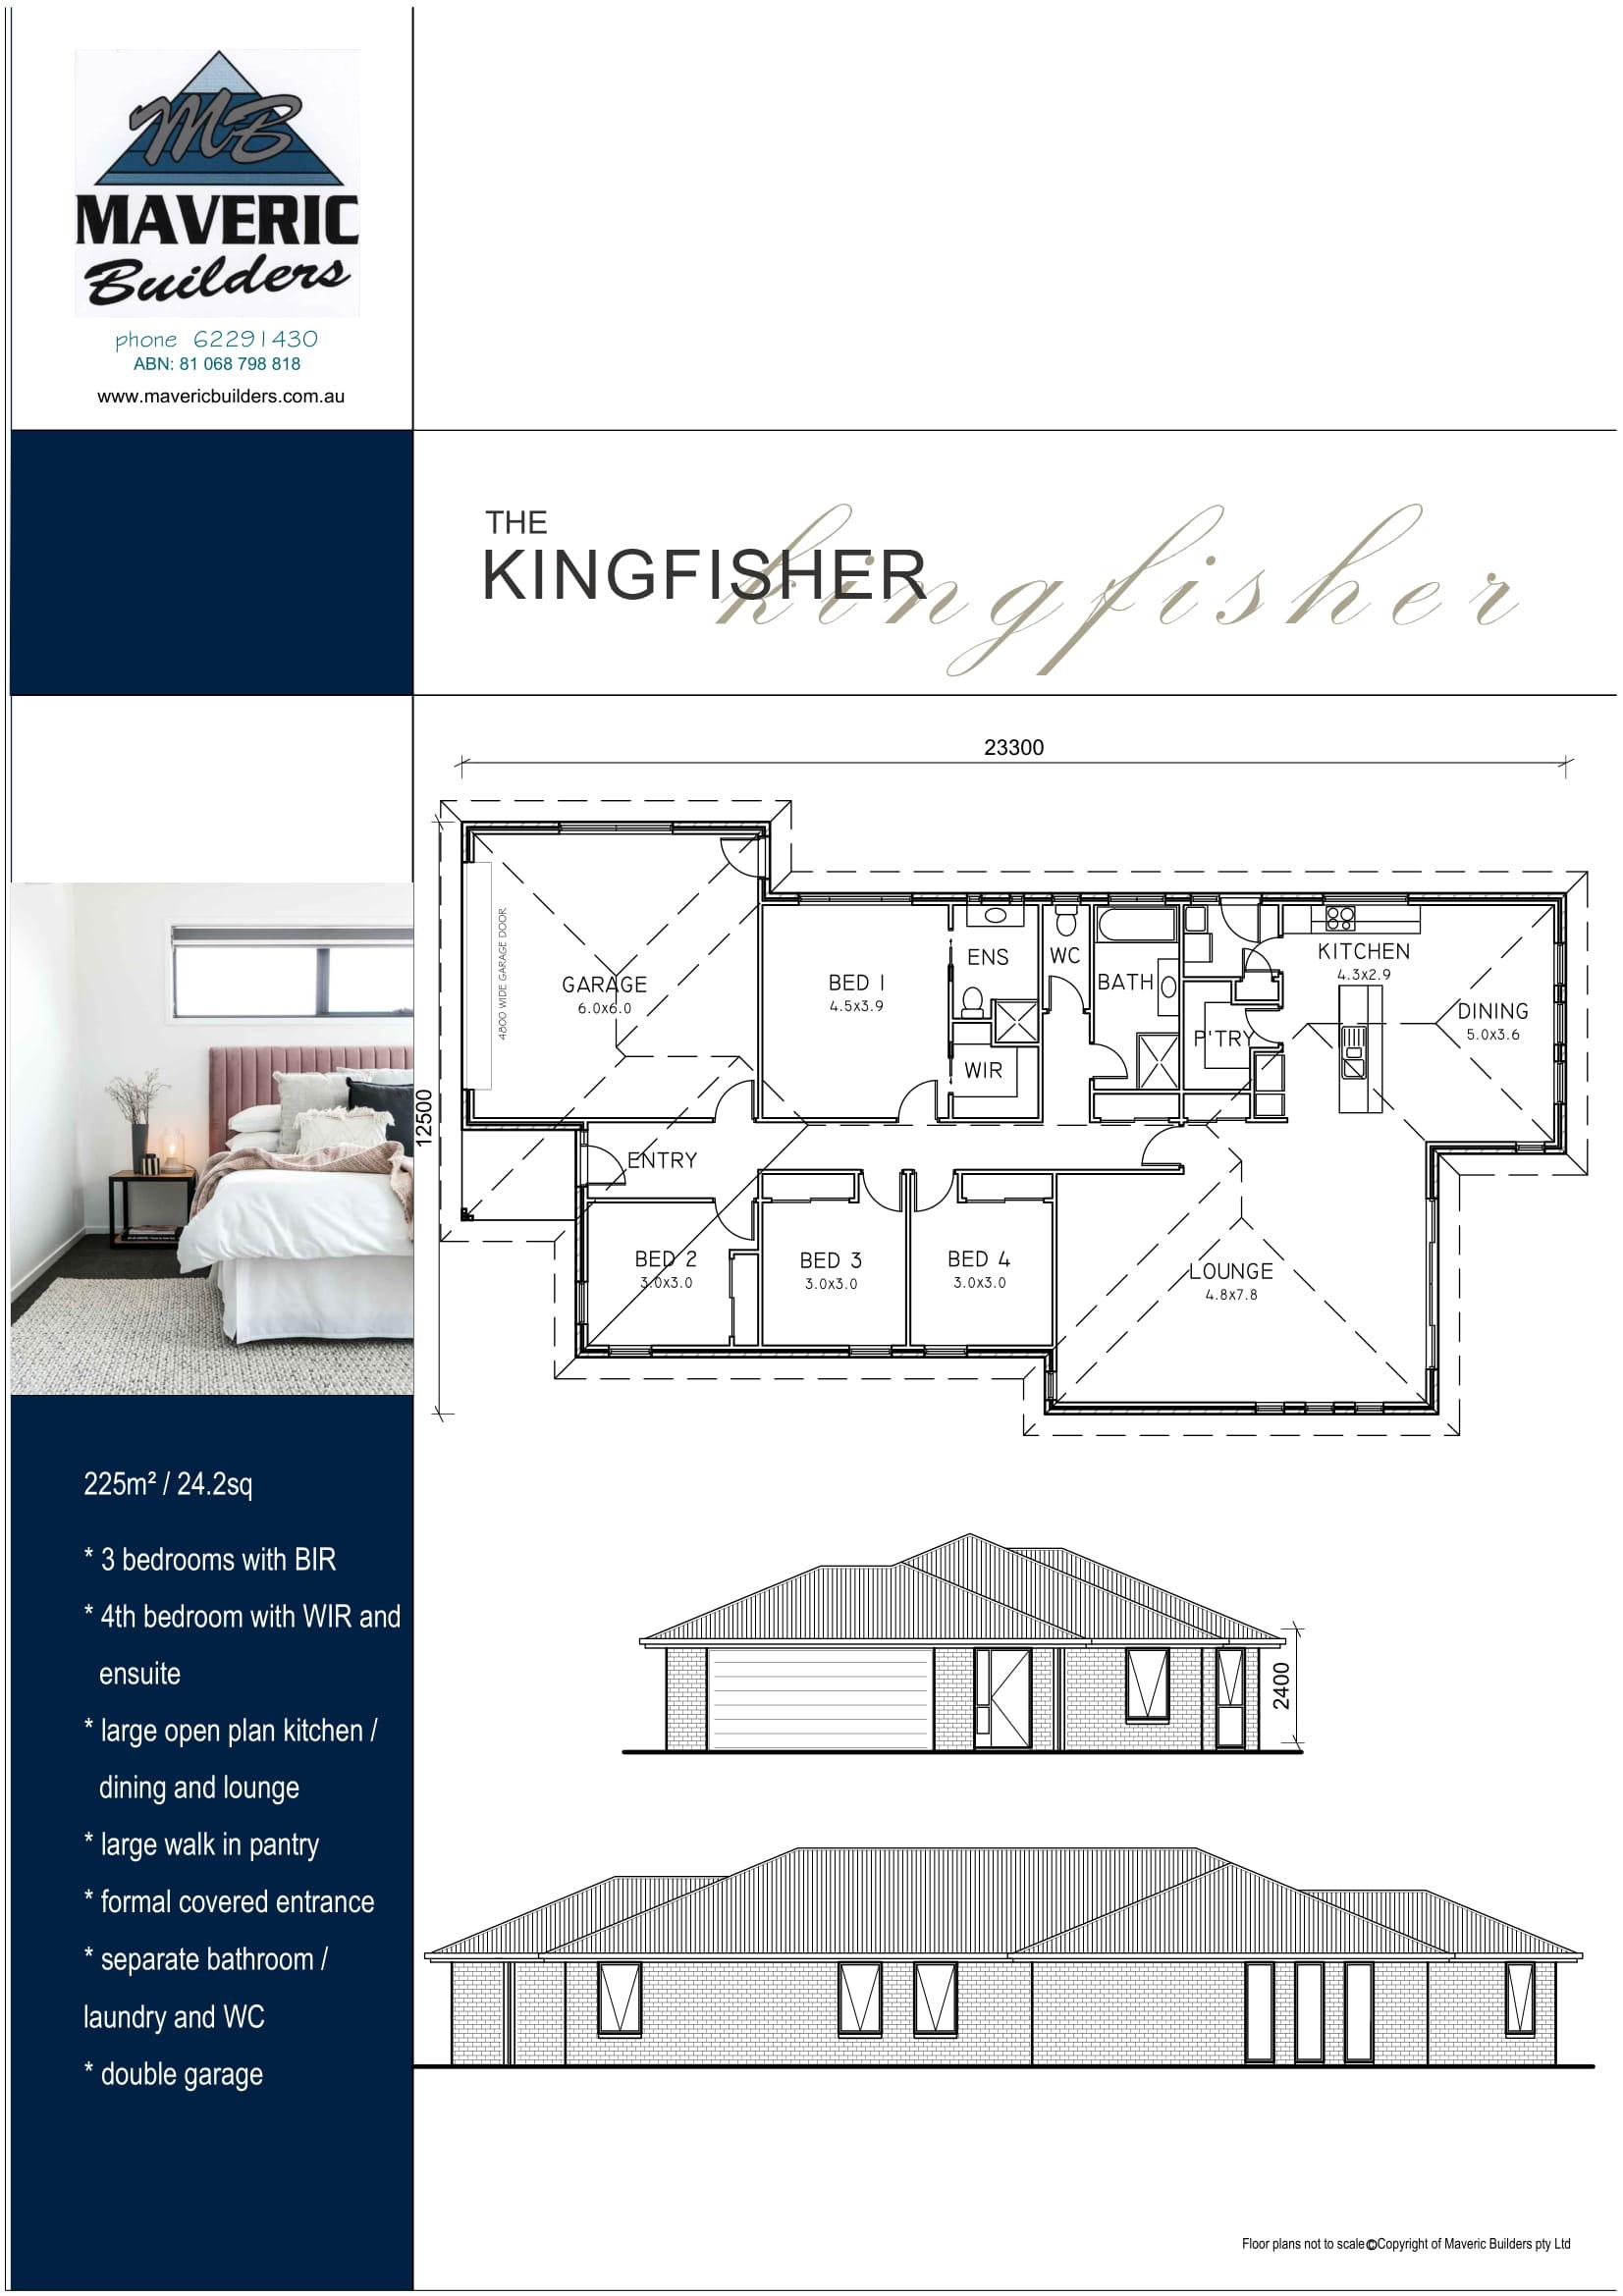 A4 Brochures 2019 01 - 24-22.jpg